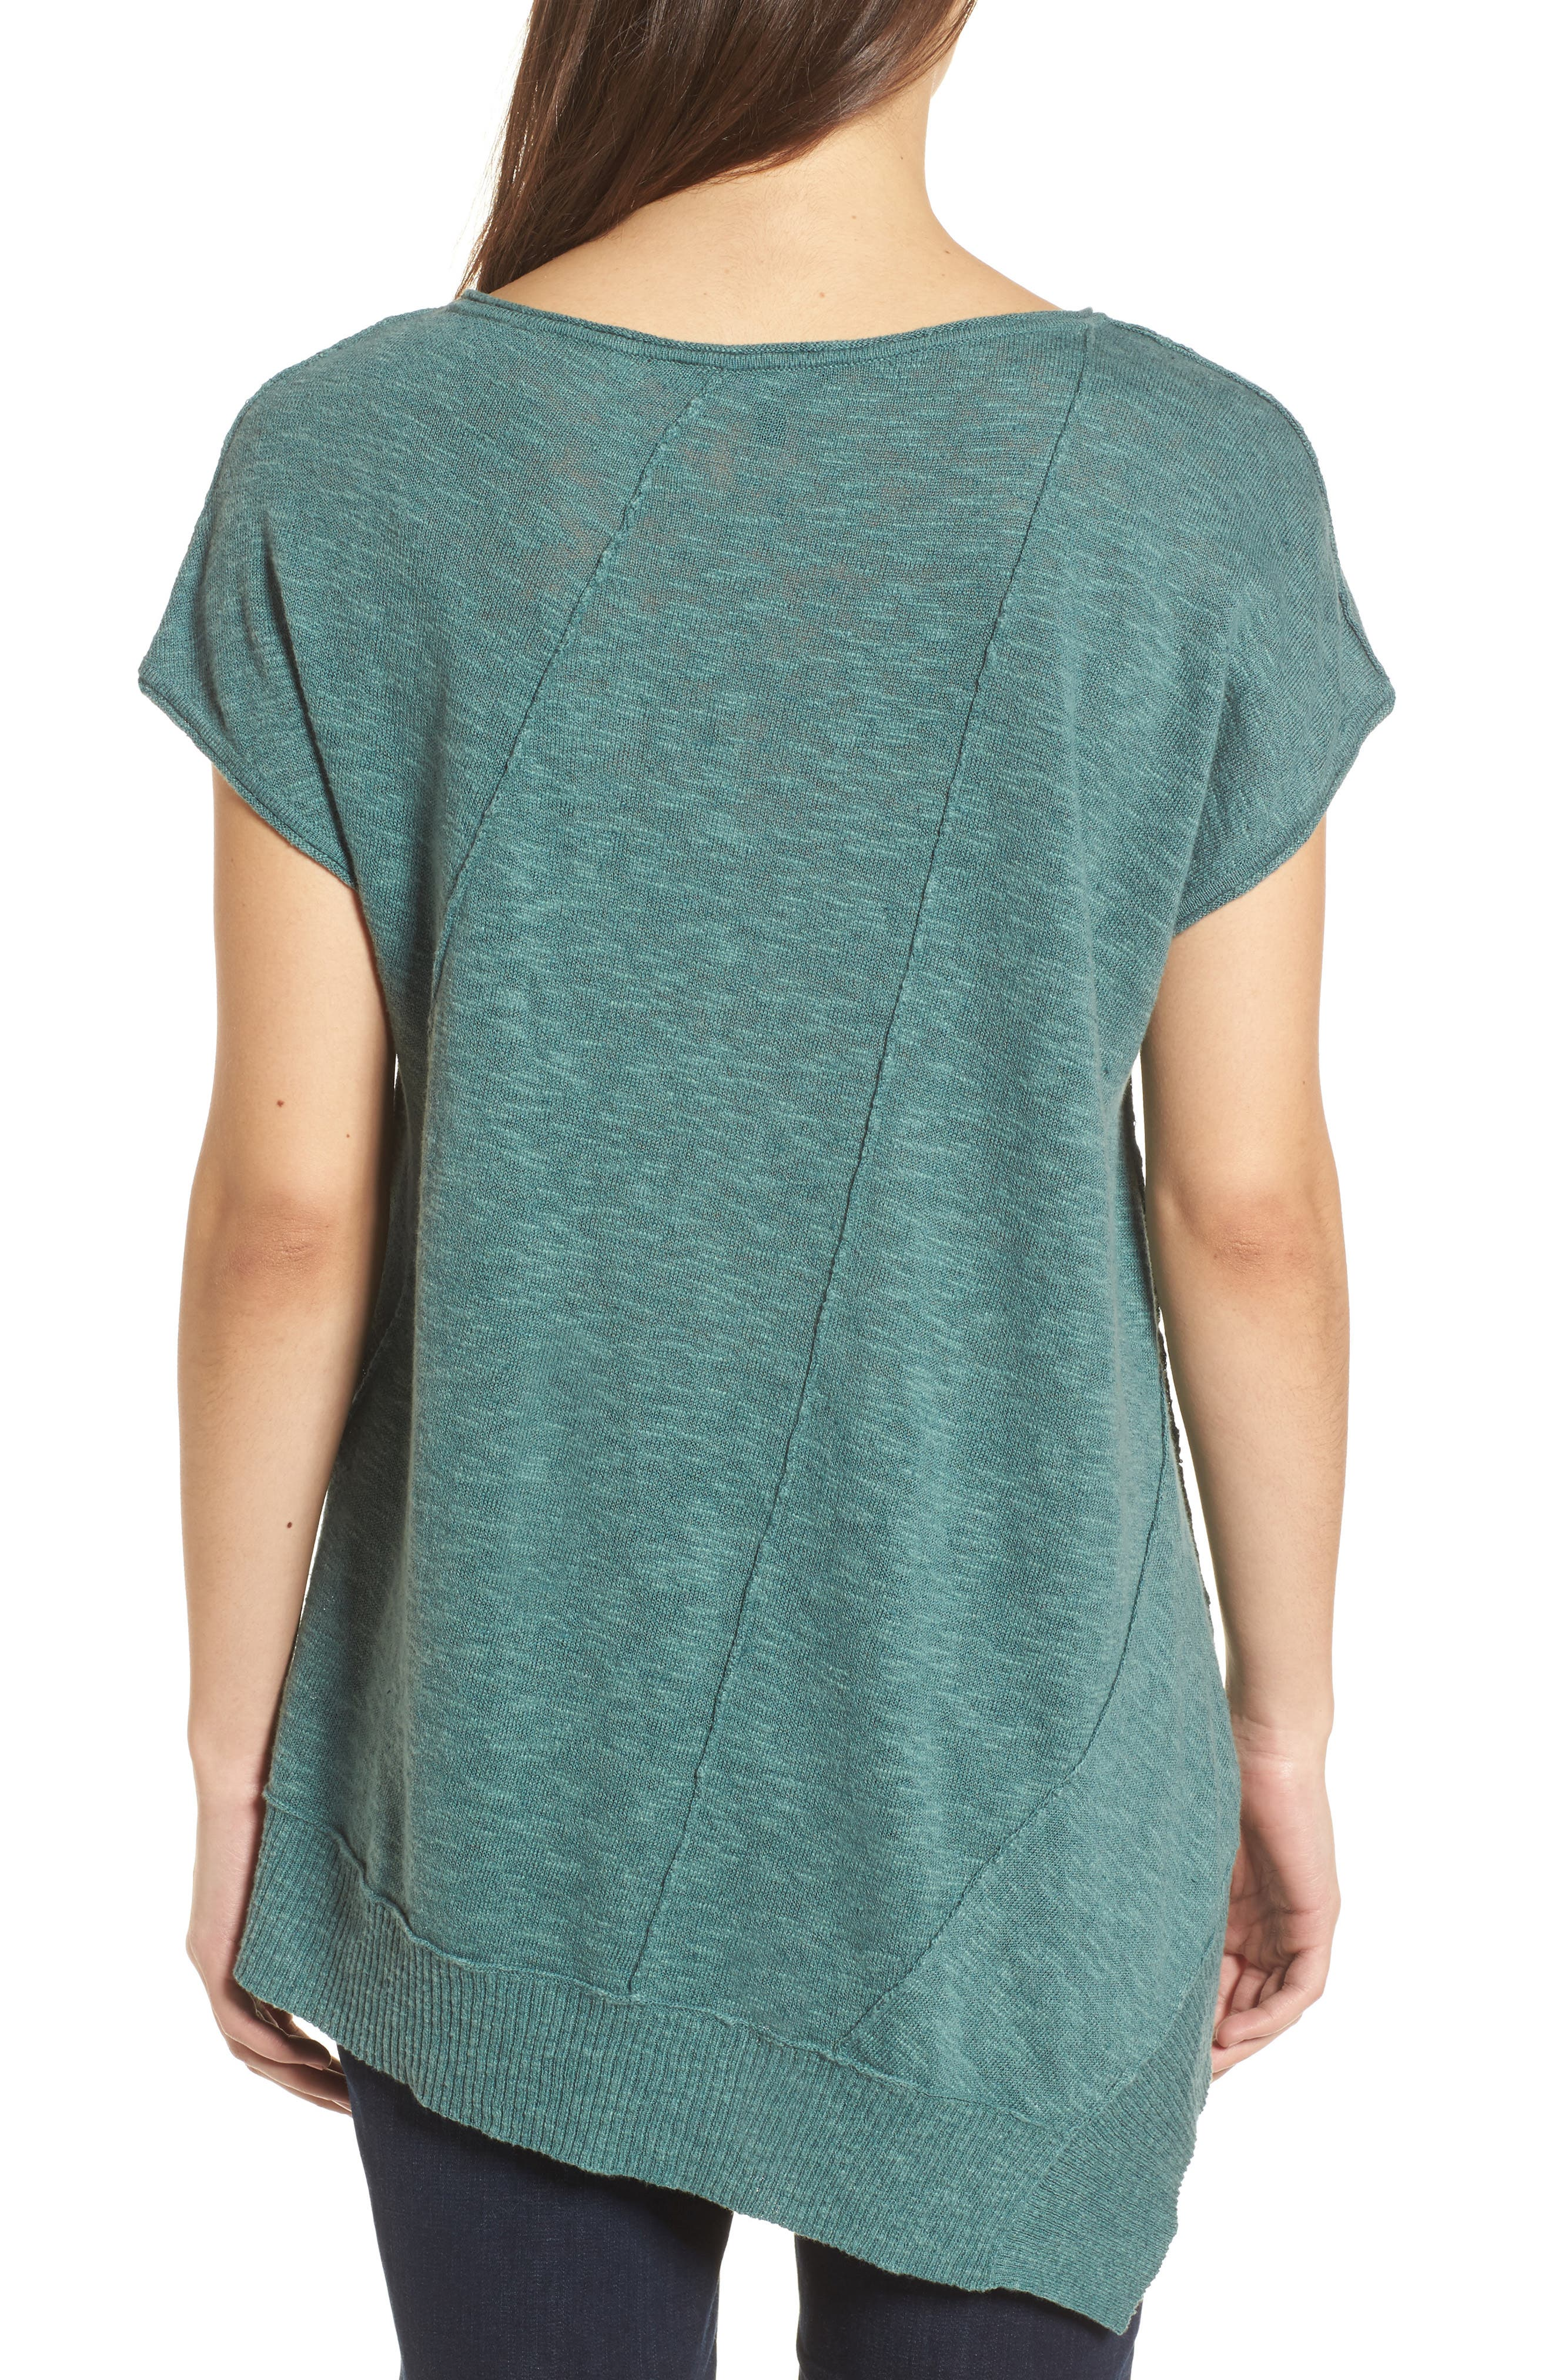 Cap Sleeve Organic Linen & Cotton Scoop Neck Top,                             Alternate thumbnail 2, color,                             Teal